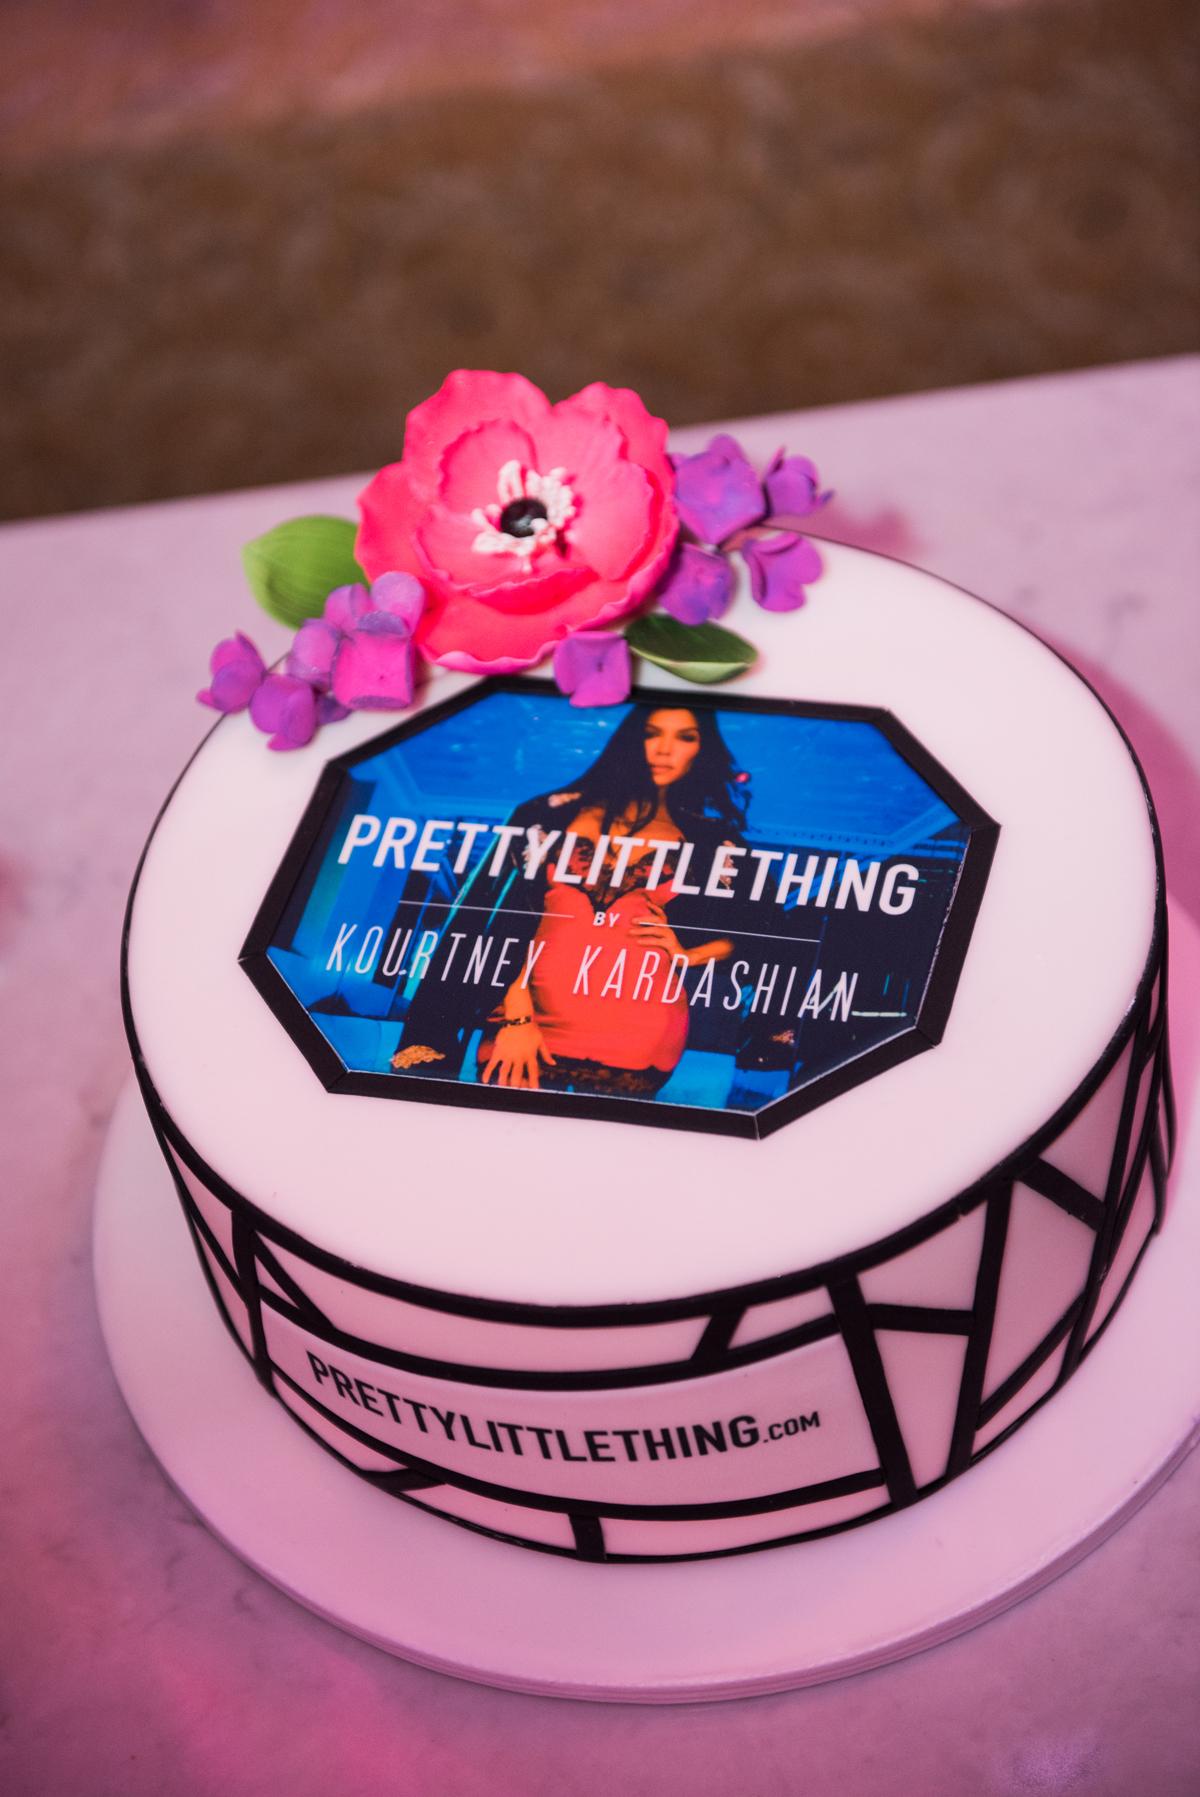 PrettyLittleThing PLT X Kourtney Kardashian Collection Celebrity Launch Party custom cake with edible topper.jpg